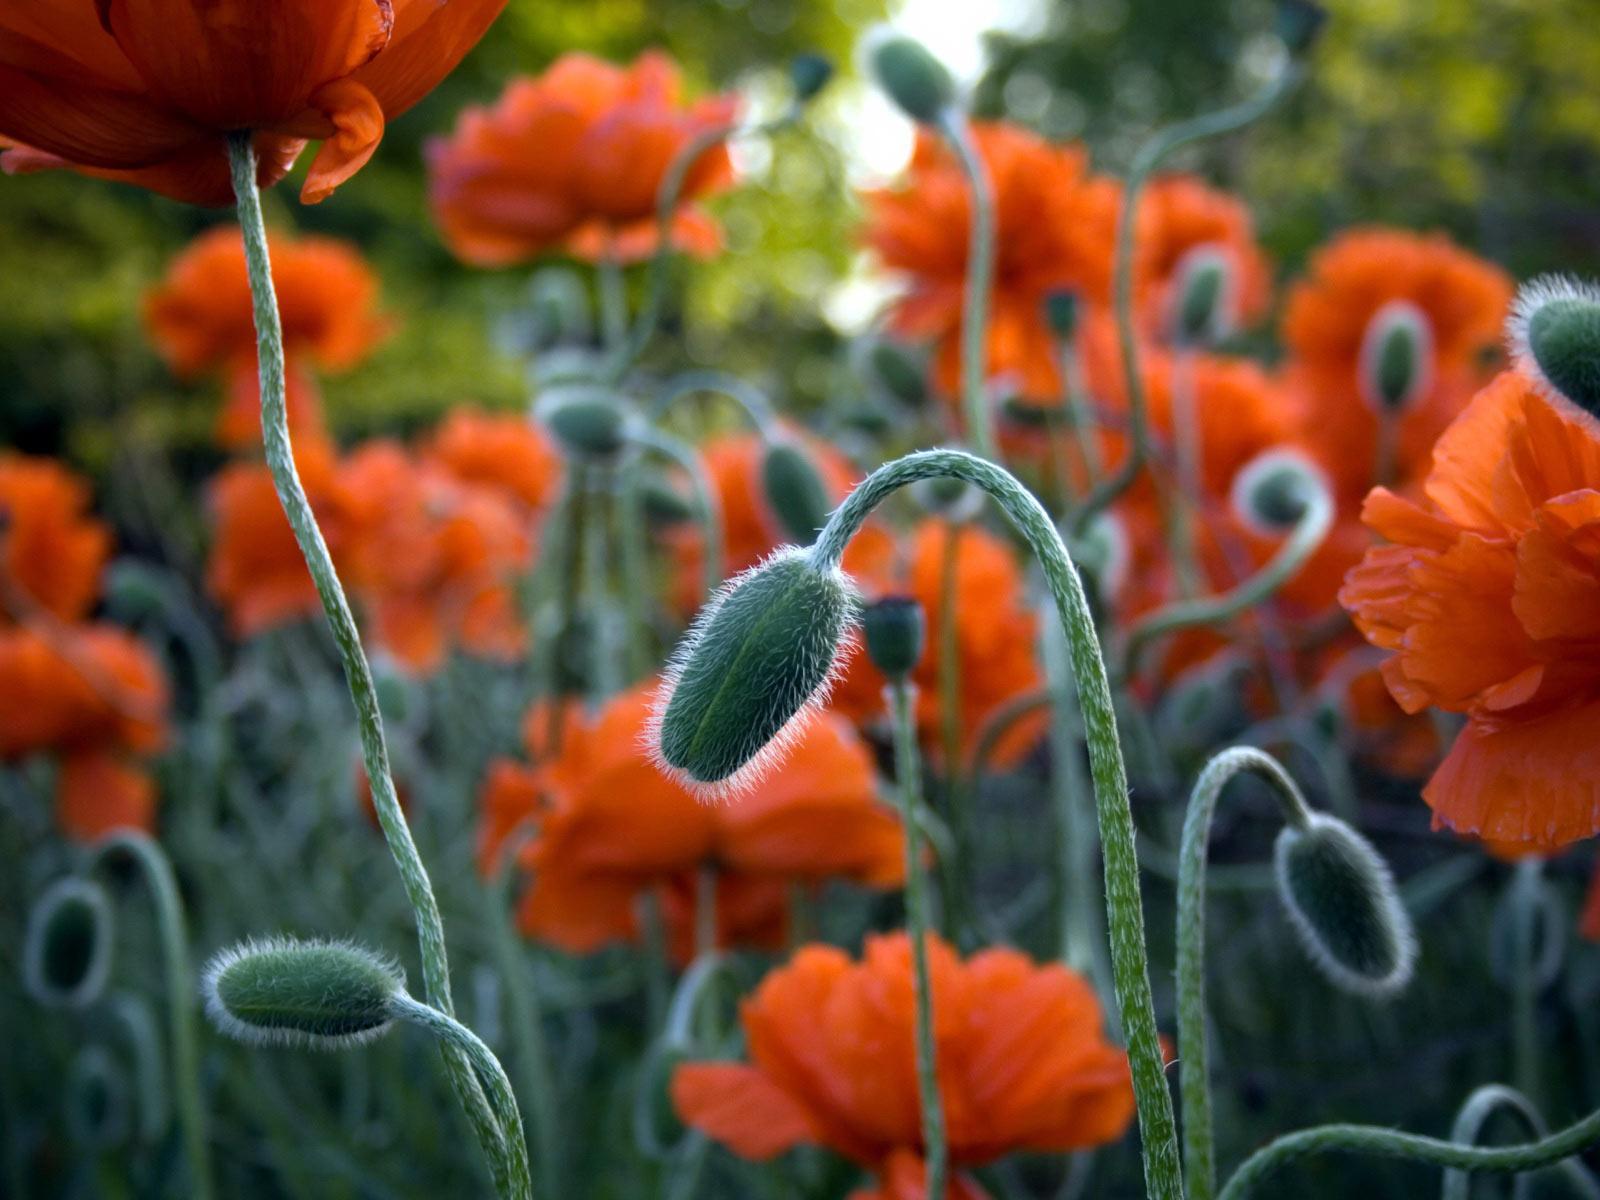 http://4.bp.blogspot.com/_CJCM6XRXugI/TUYxFVEGVZI/AAAAAAAAFQ4/fRmTshpVXMo/s1600/Red_Poppy.jpg